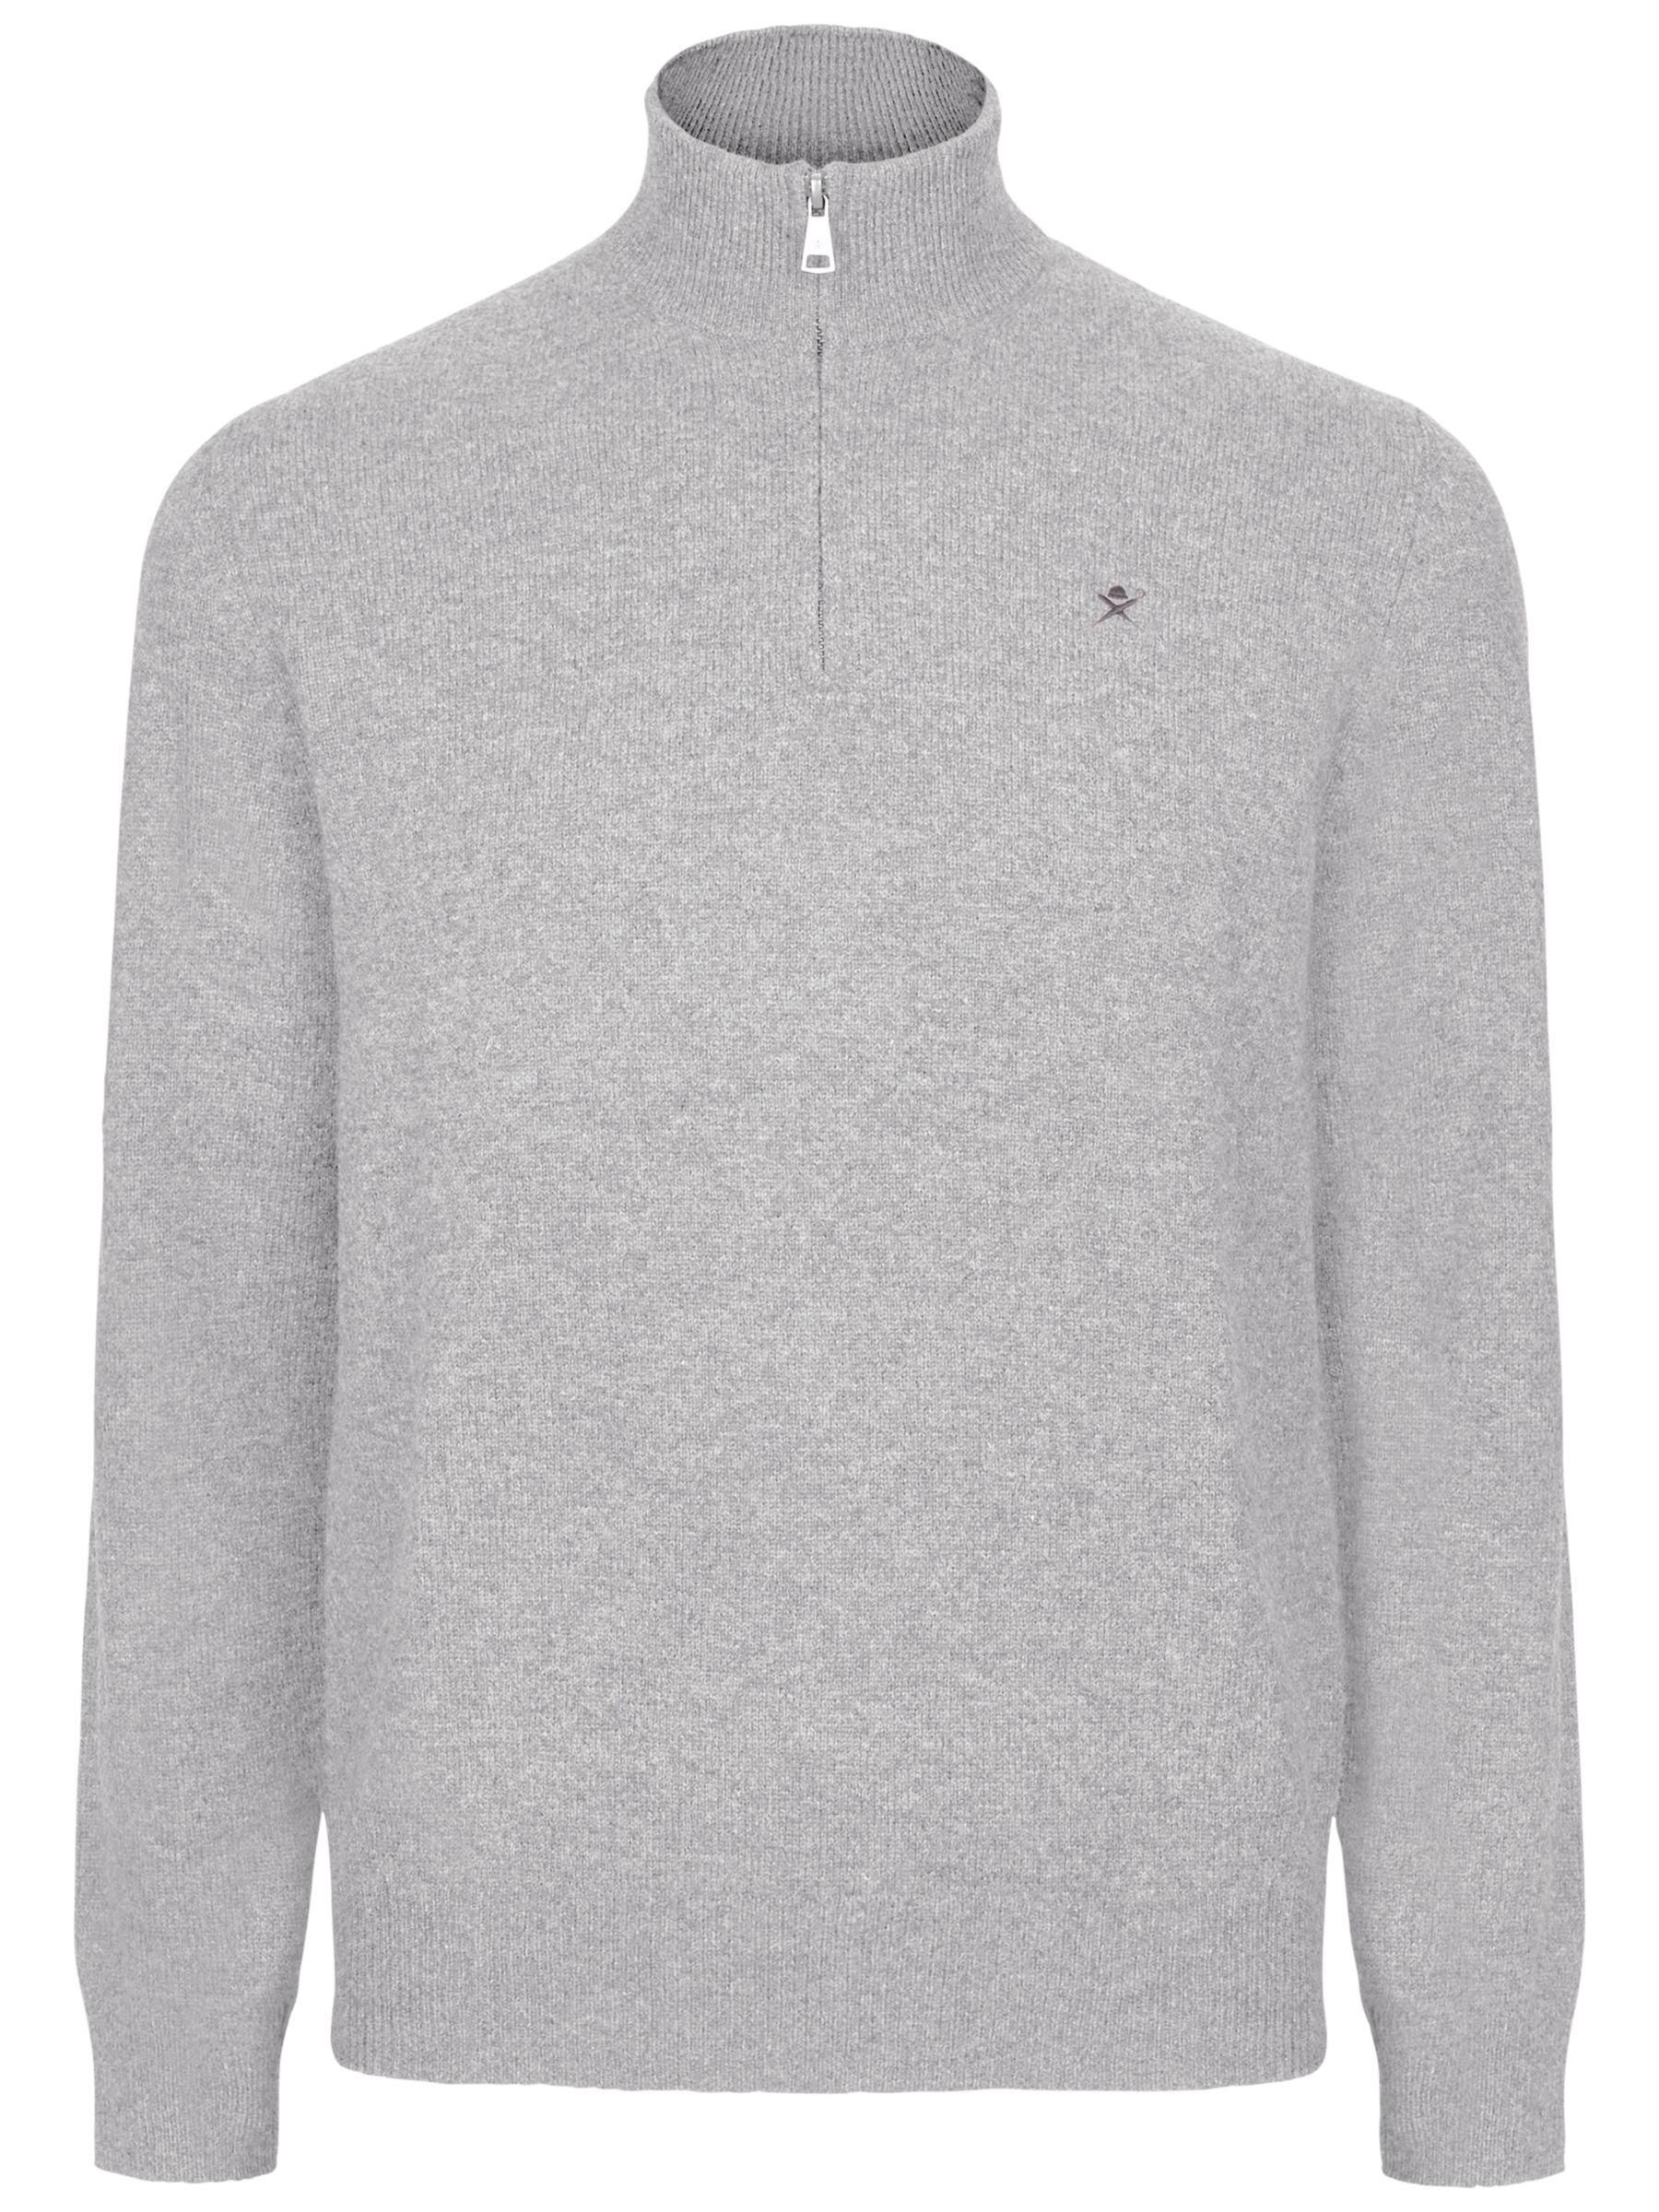 Hackett London Hackett London Cotton Cashmere Half Zip Jumper, Grey Marl